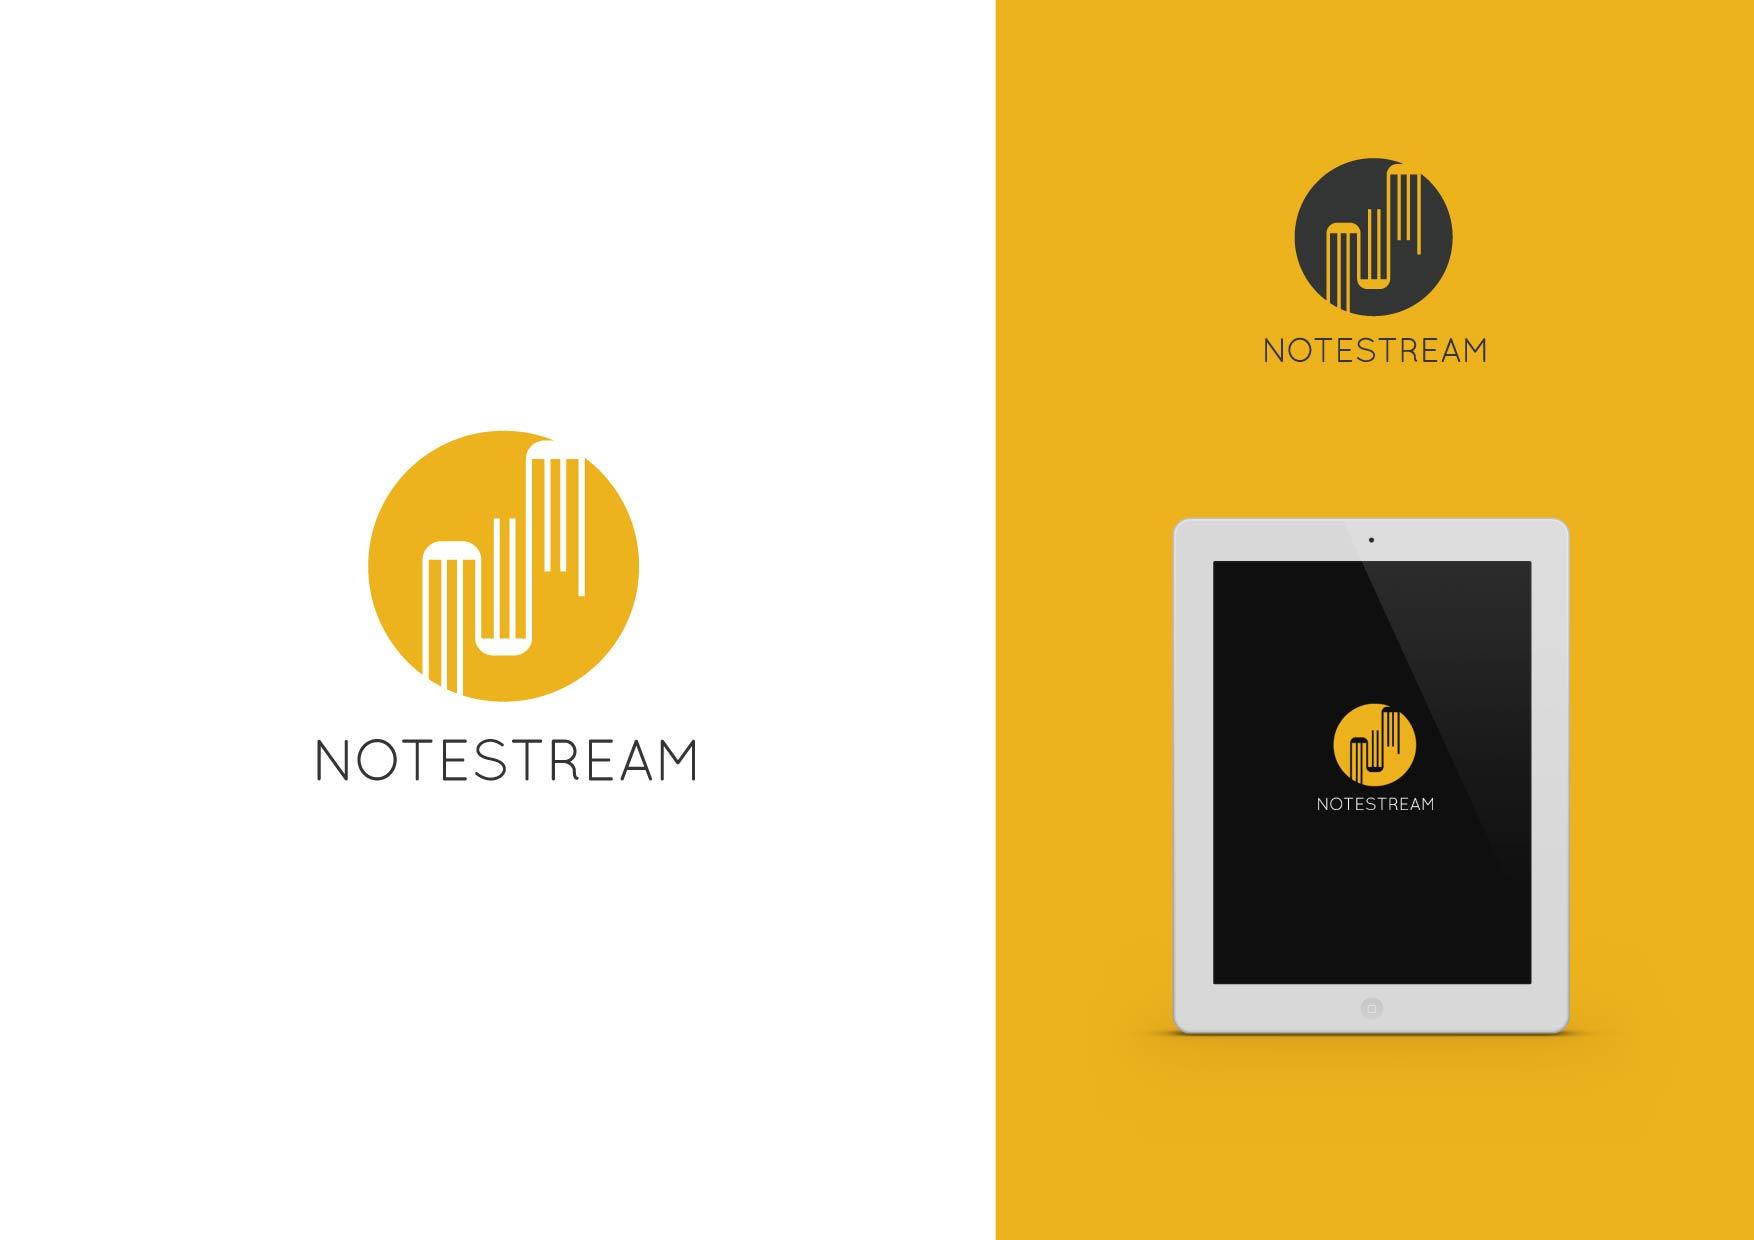 Logo Design by Osi Indra - Entry No. 44 in the Logo Design Contest Imaginative Logo Design for NoteStream.